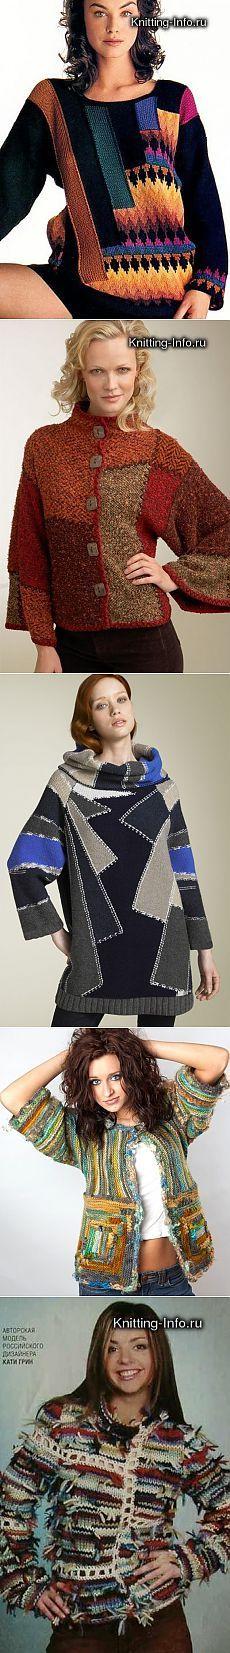 Los modelos en el estilo de & quot; & quot; patchwork